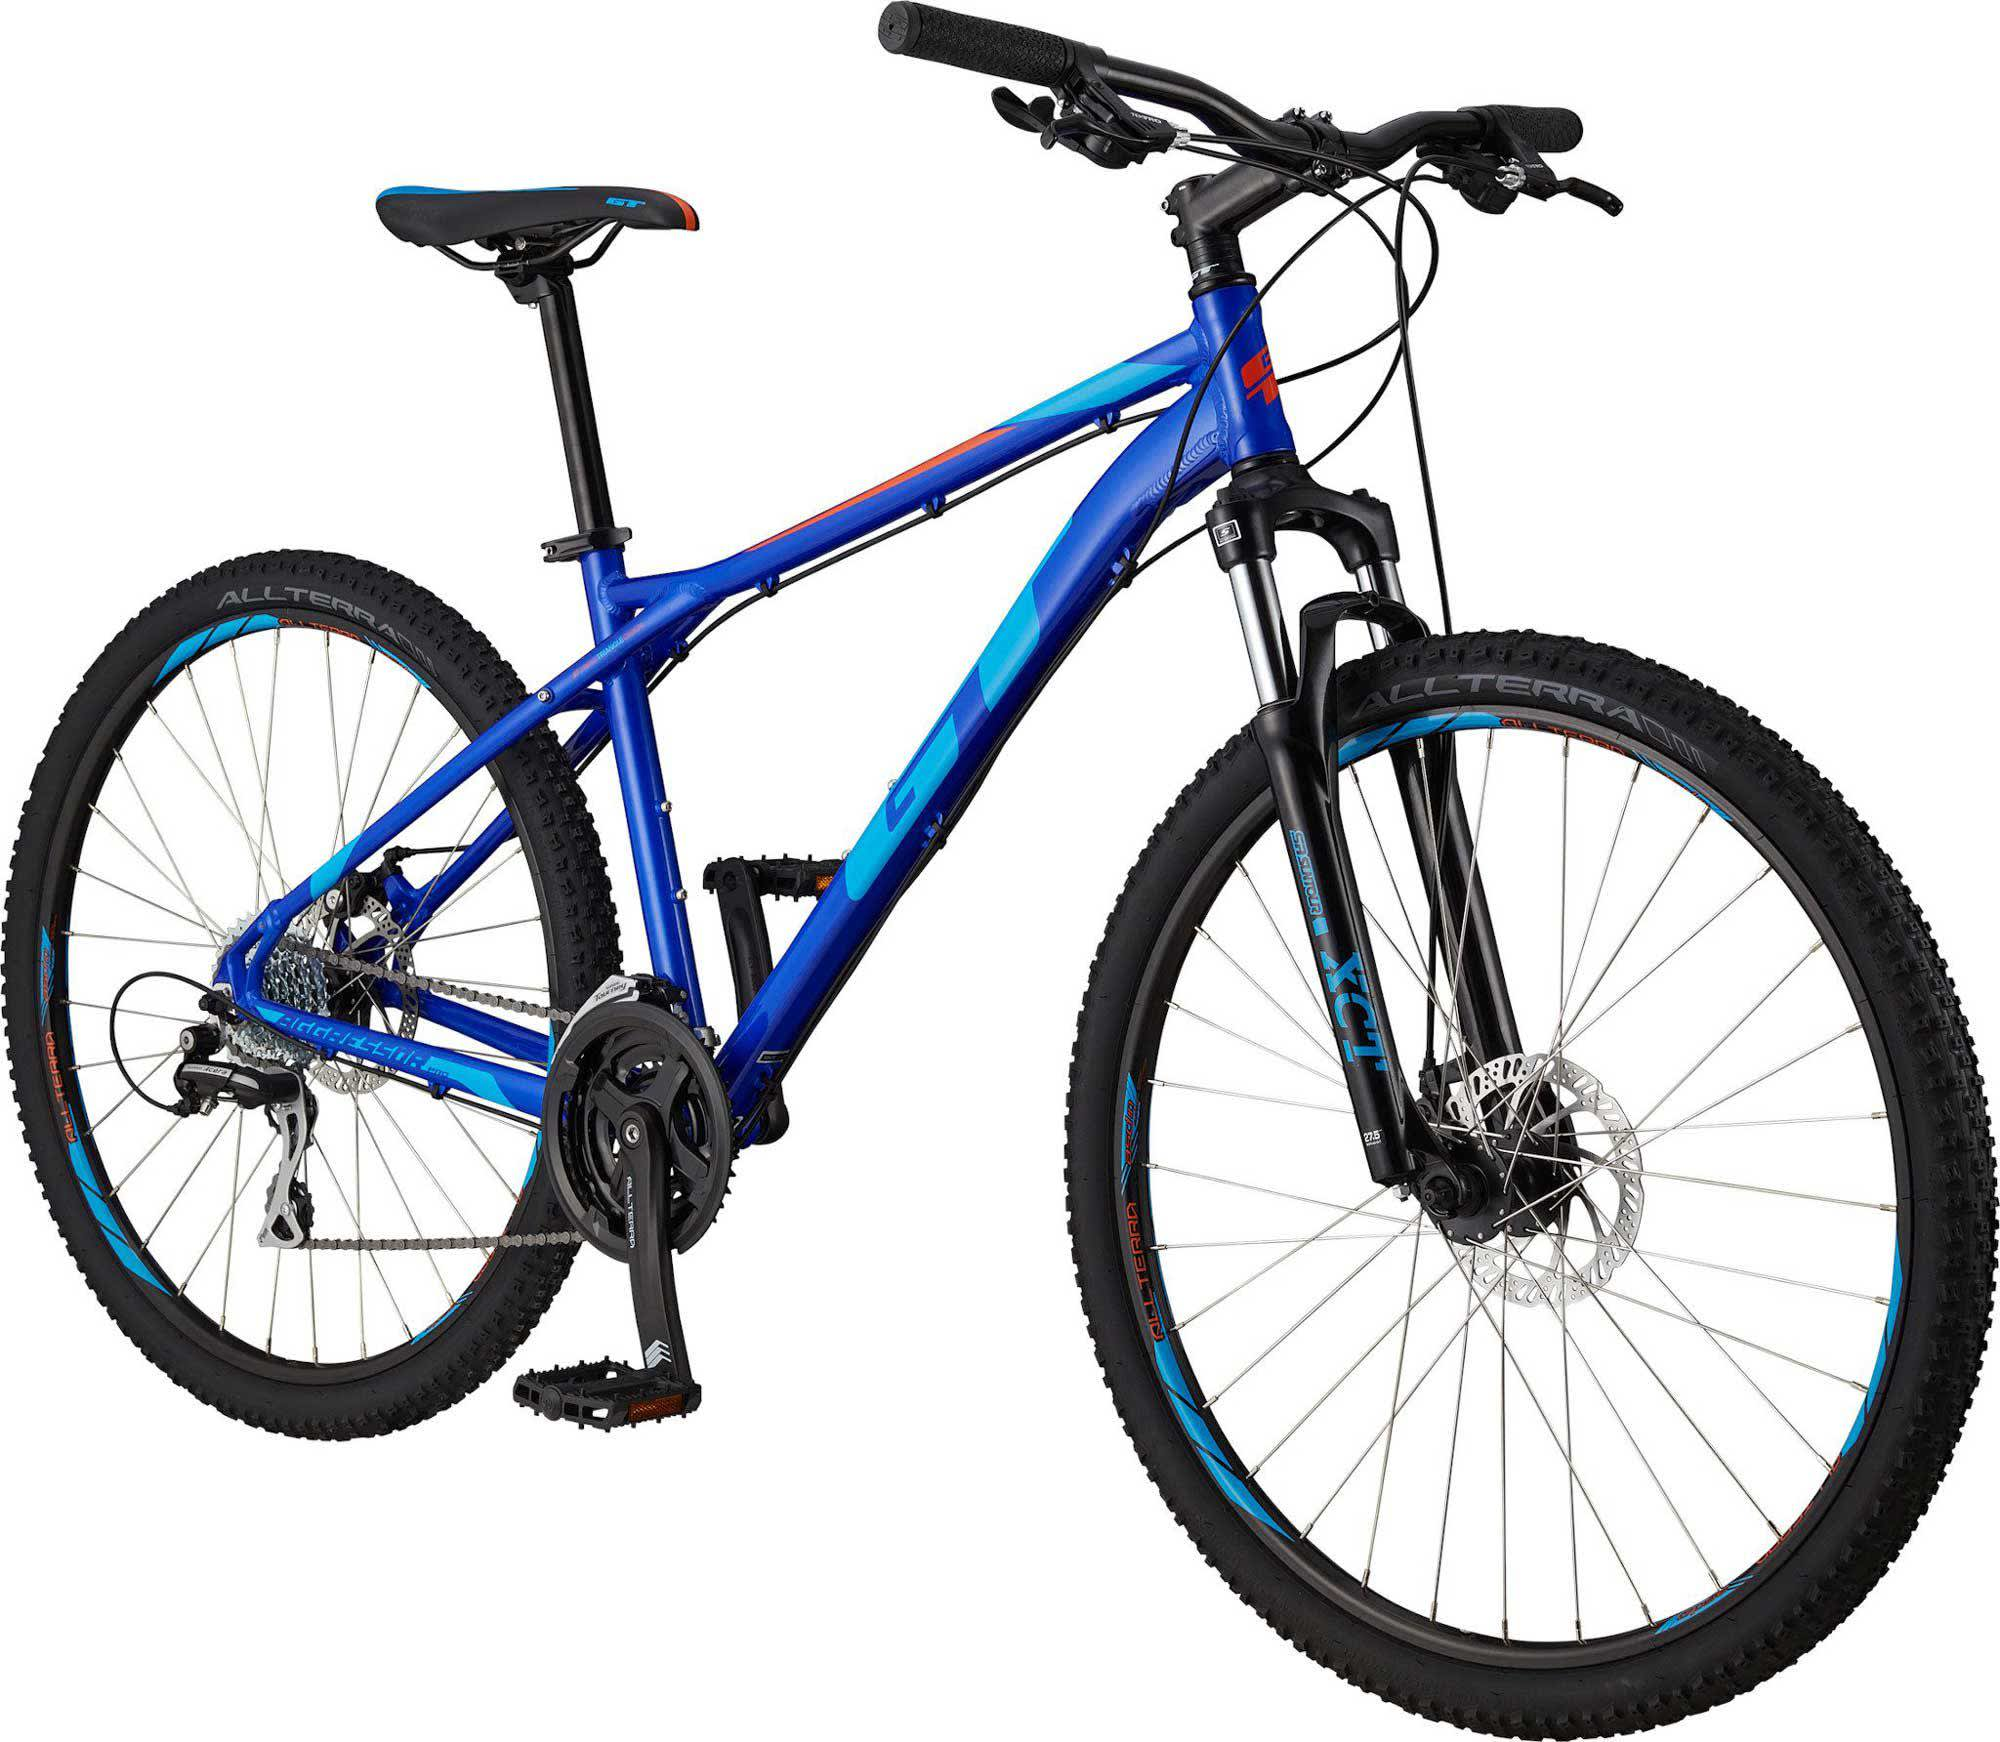 Bike Deals at Dick's Sporting Goods